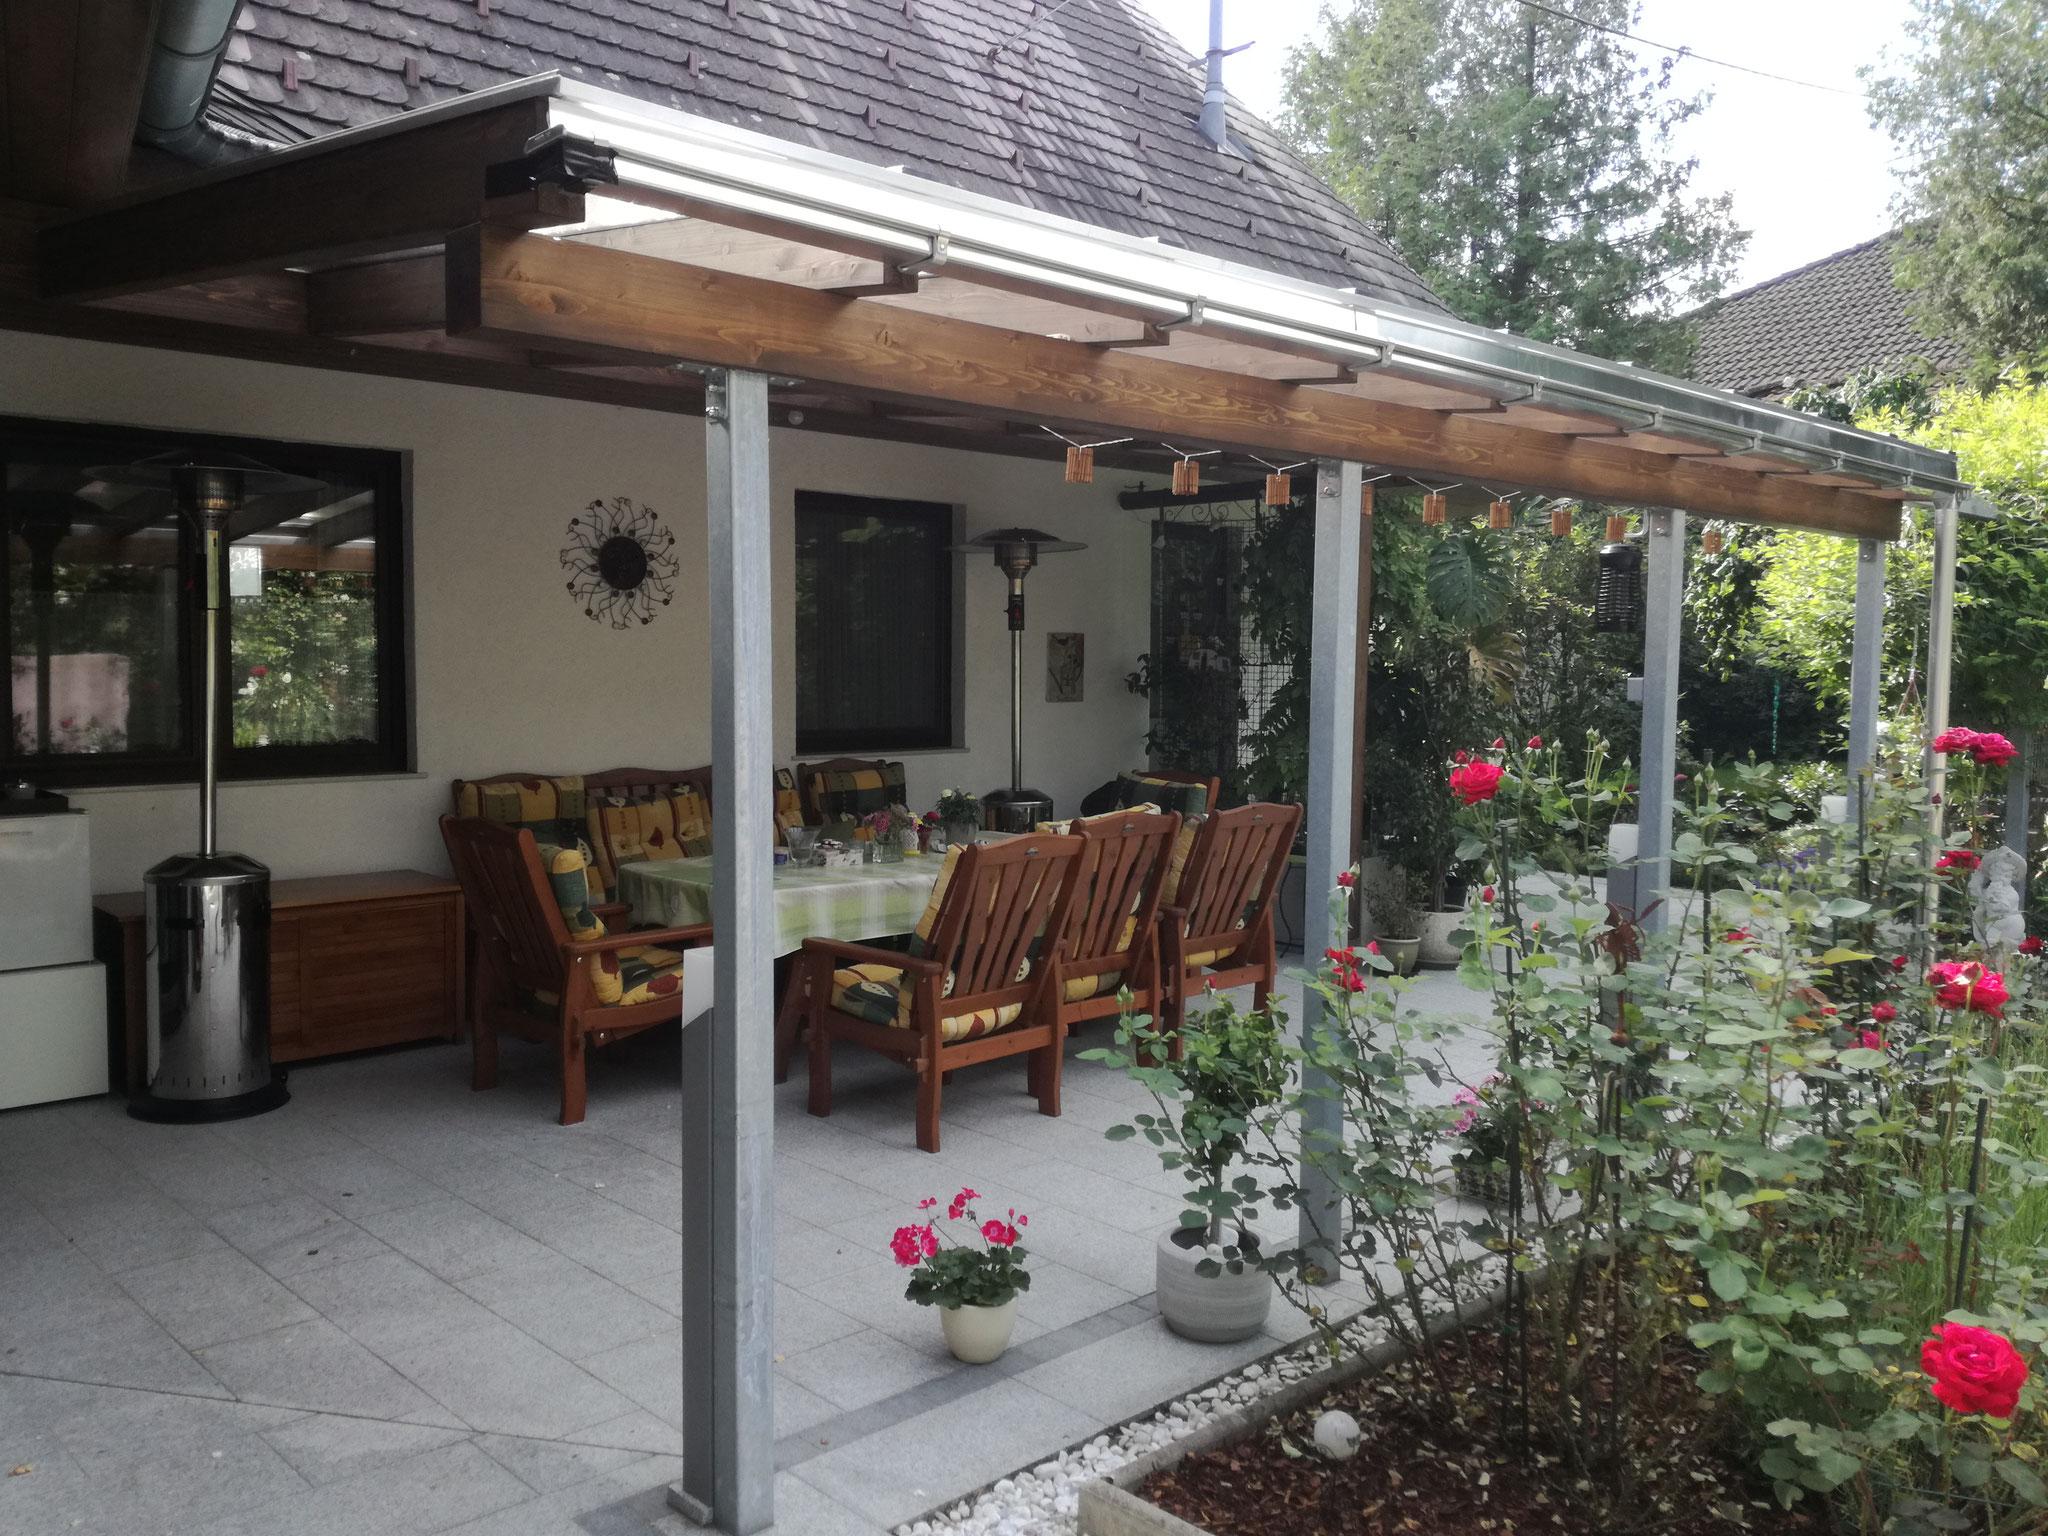 Terrassenüberdachung mit Thermoclear - Stegplatten